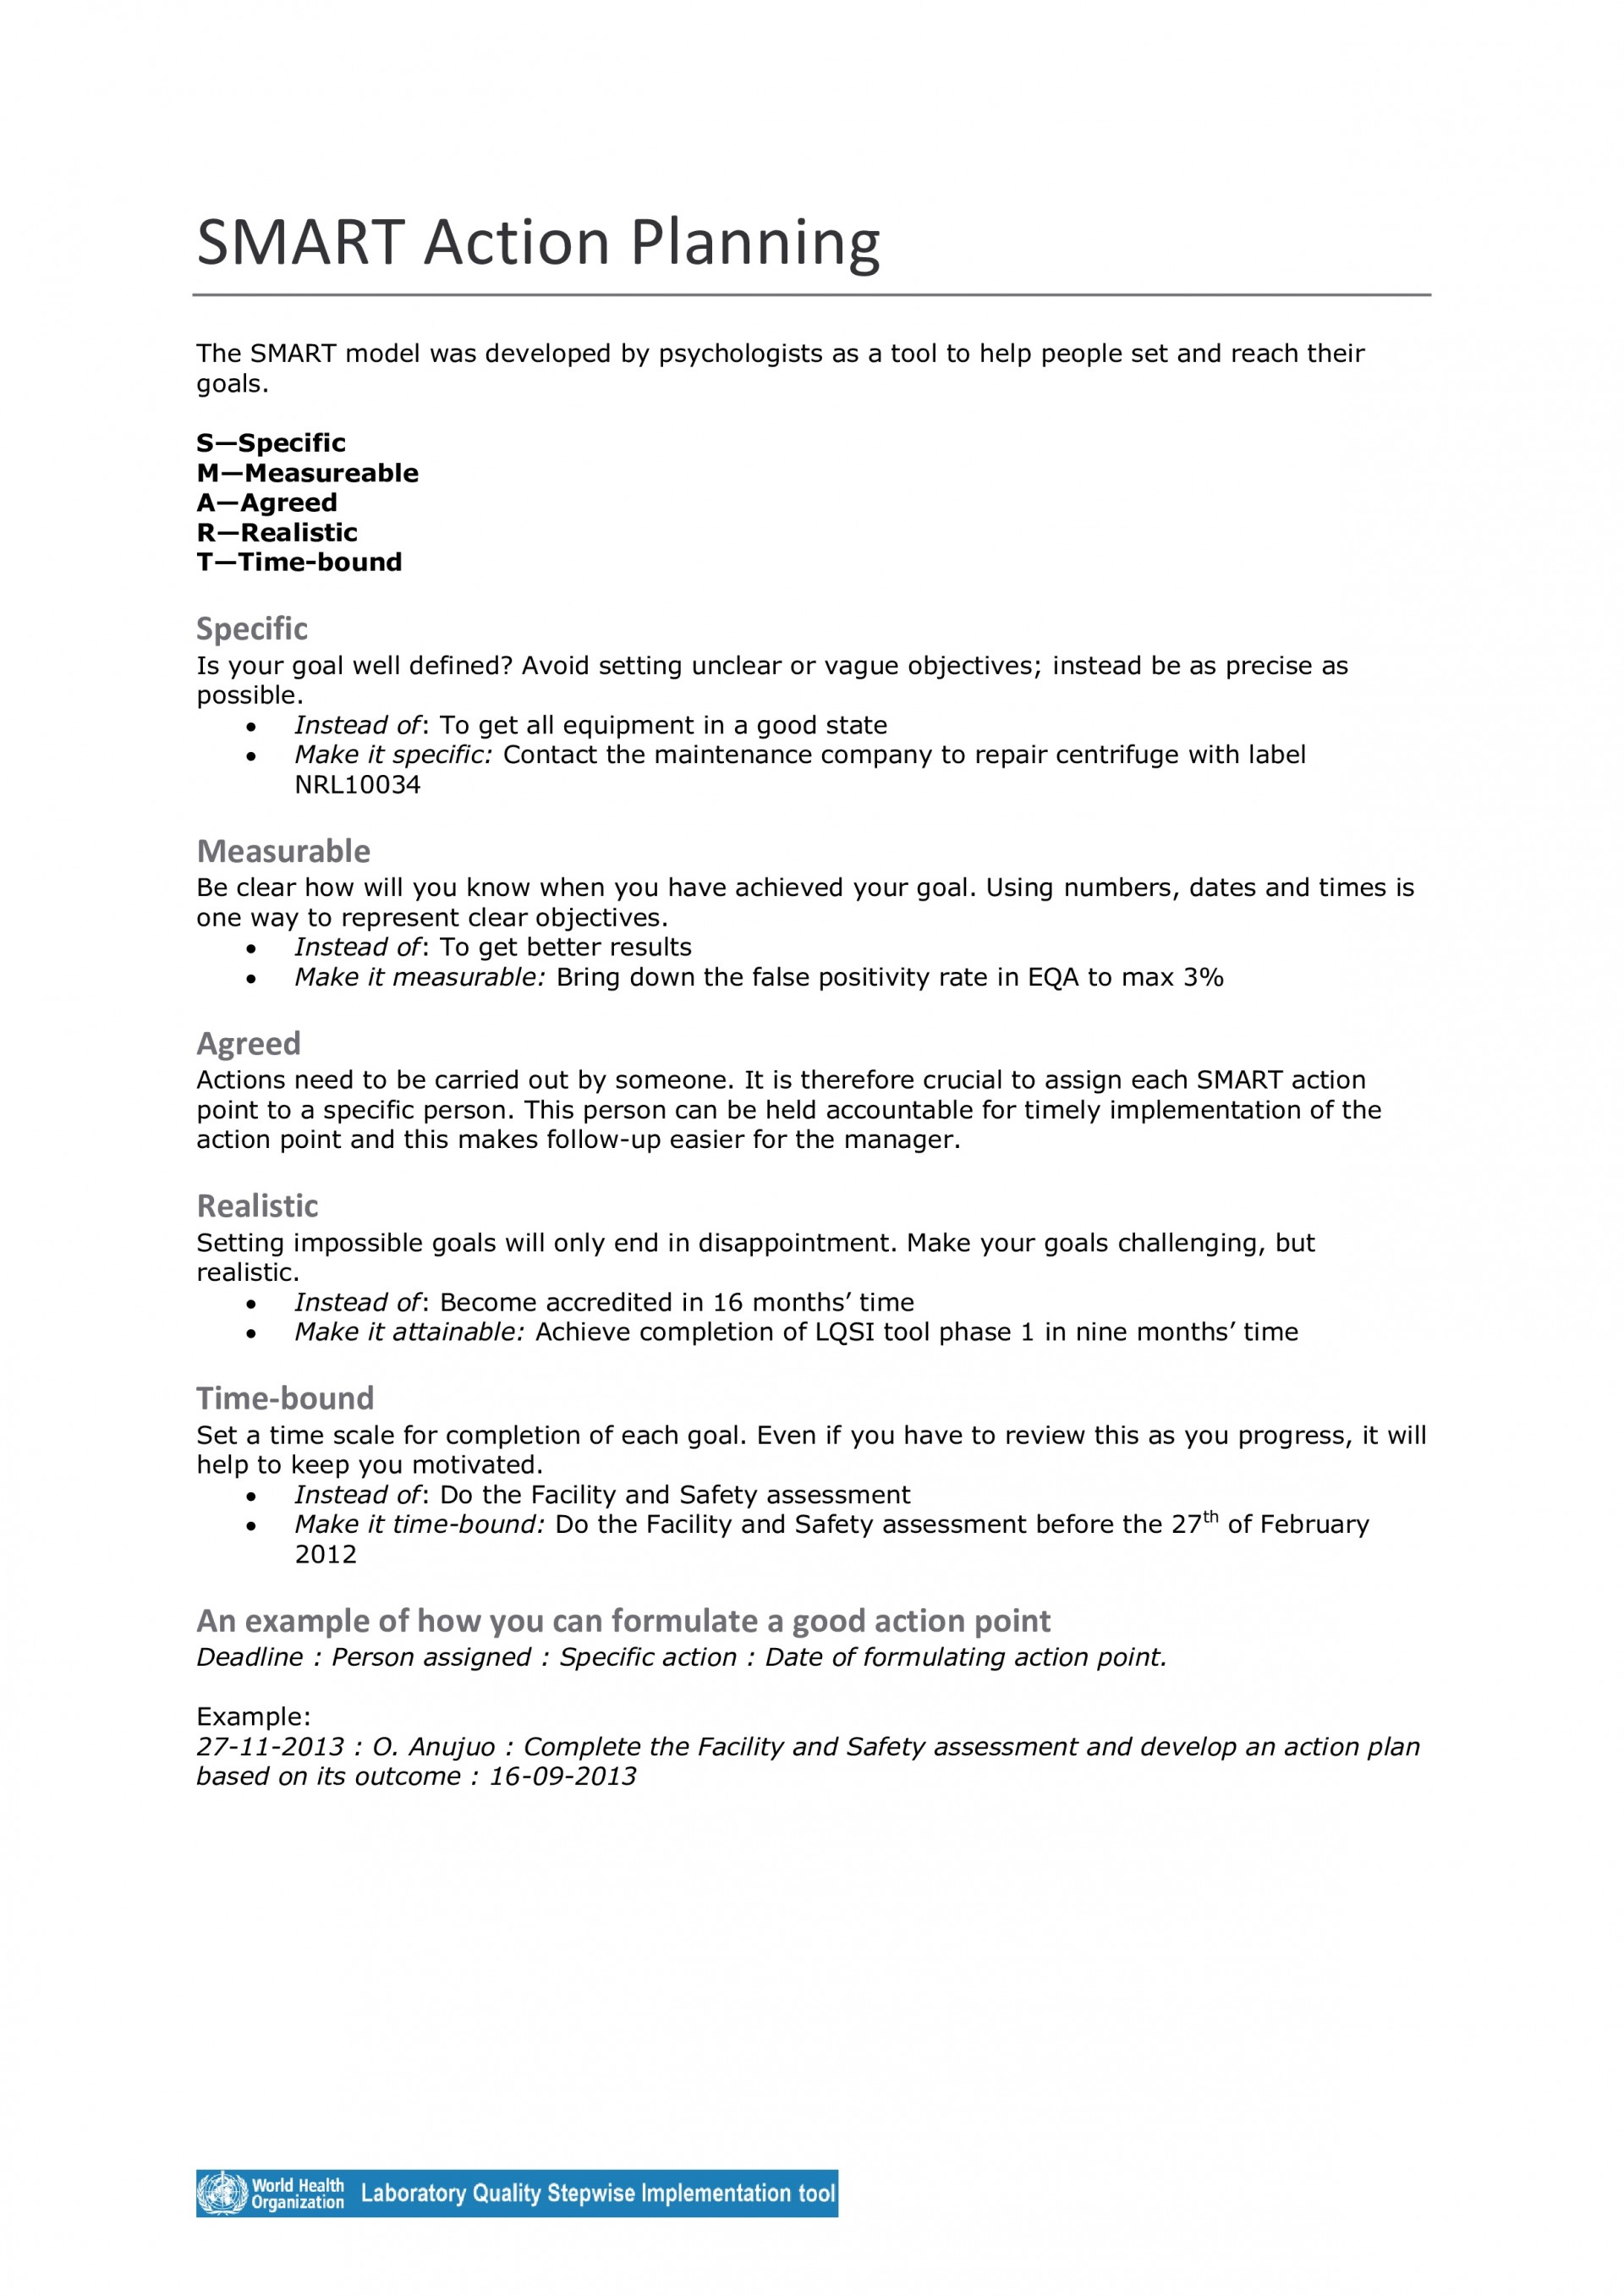 003 Sensational Smart Action Plan Template Example  Nh Download Nursing1920